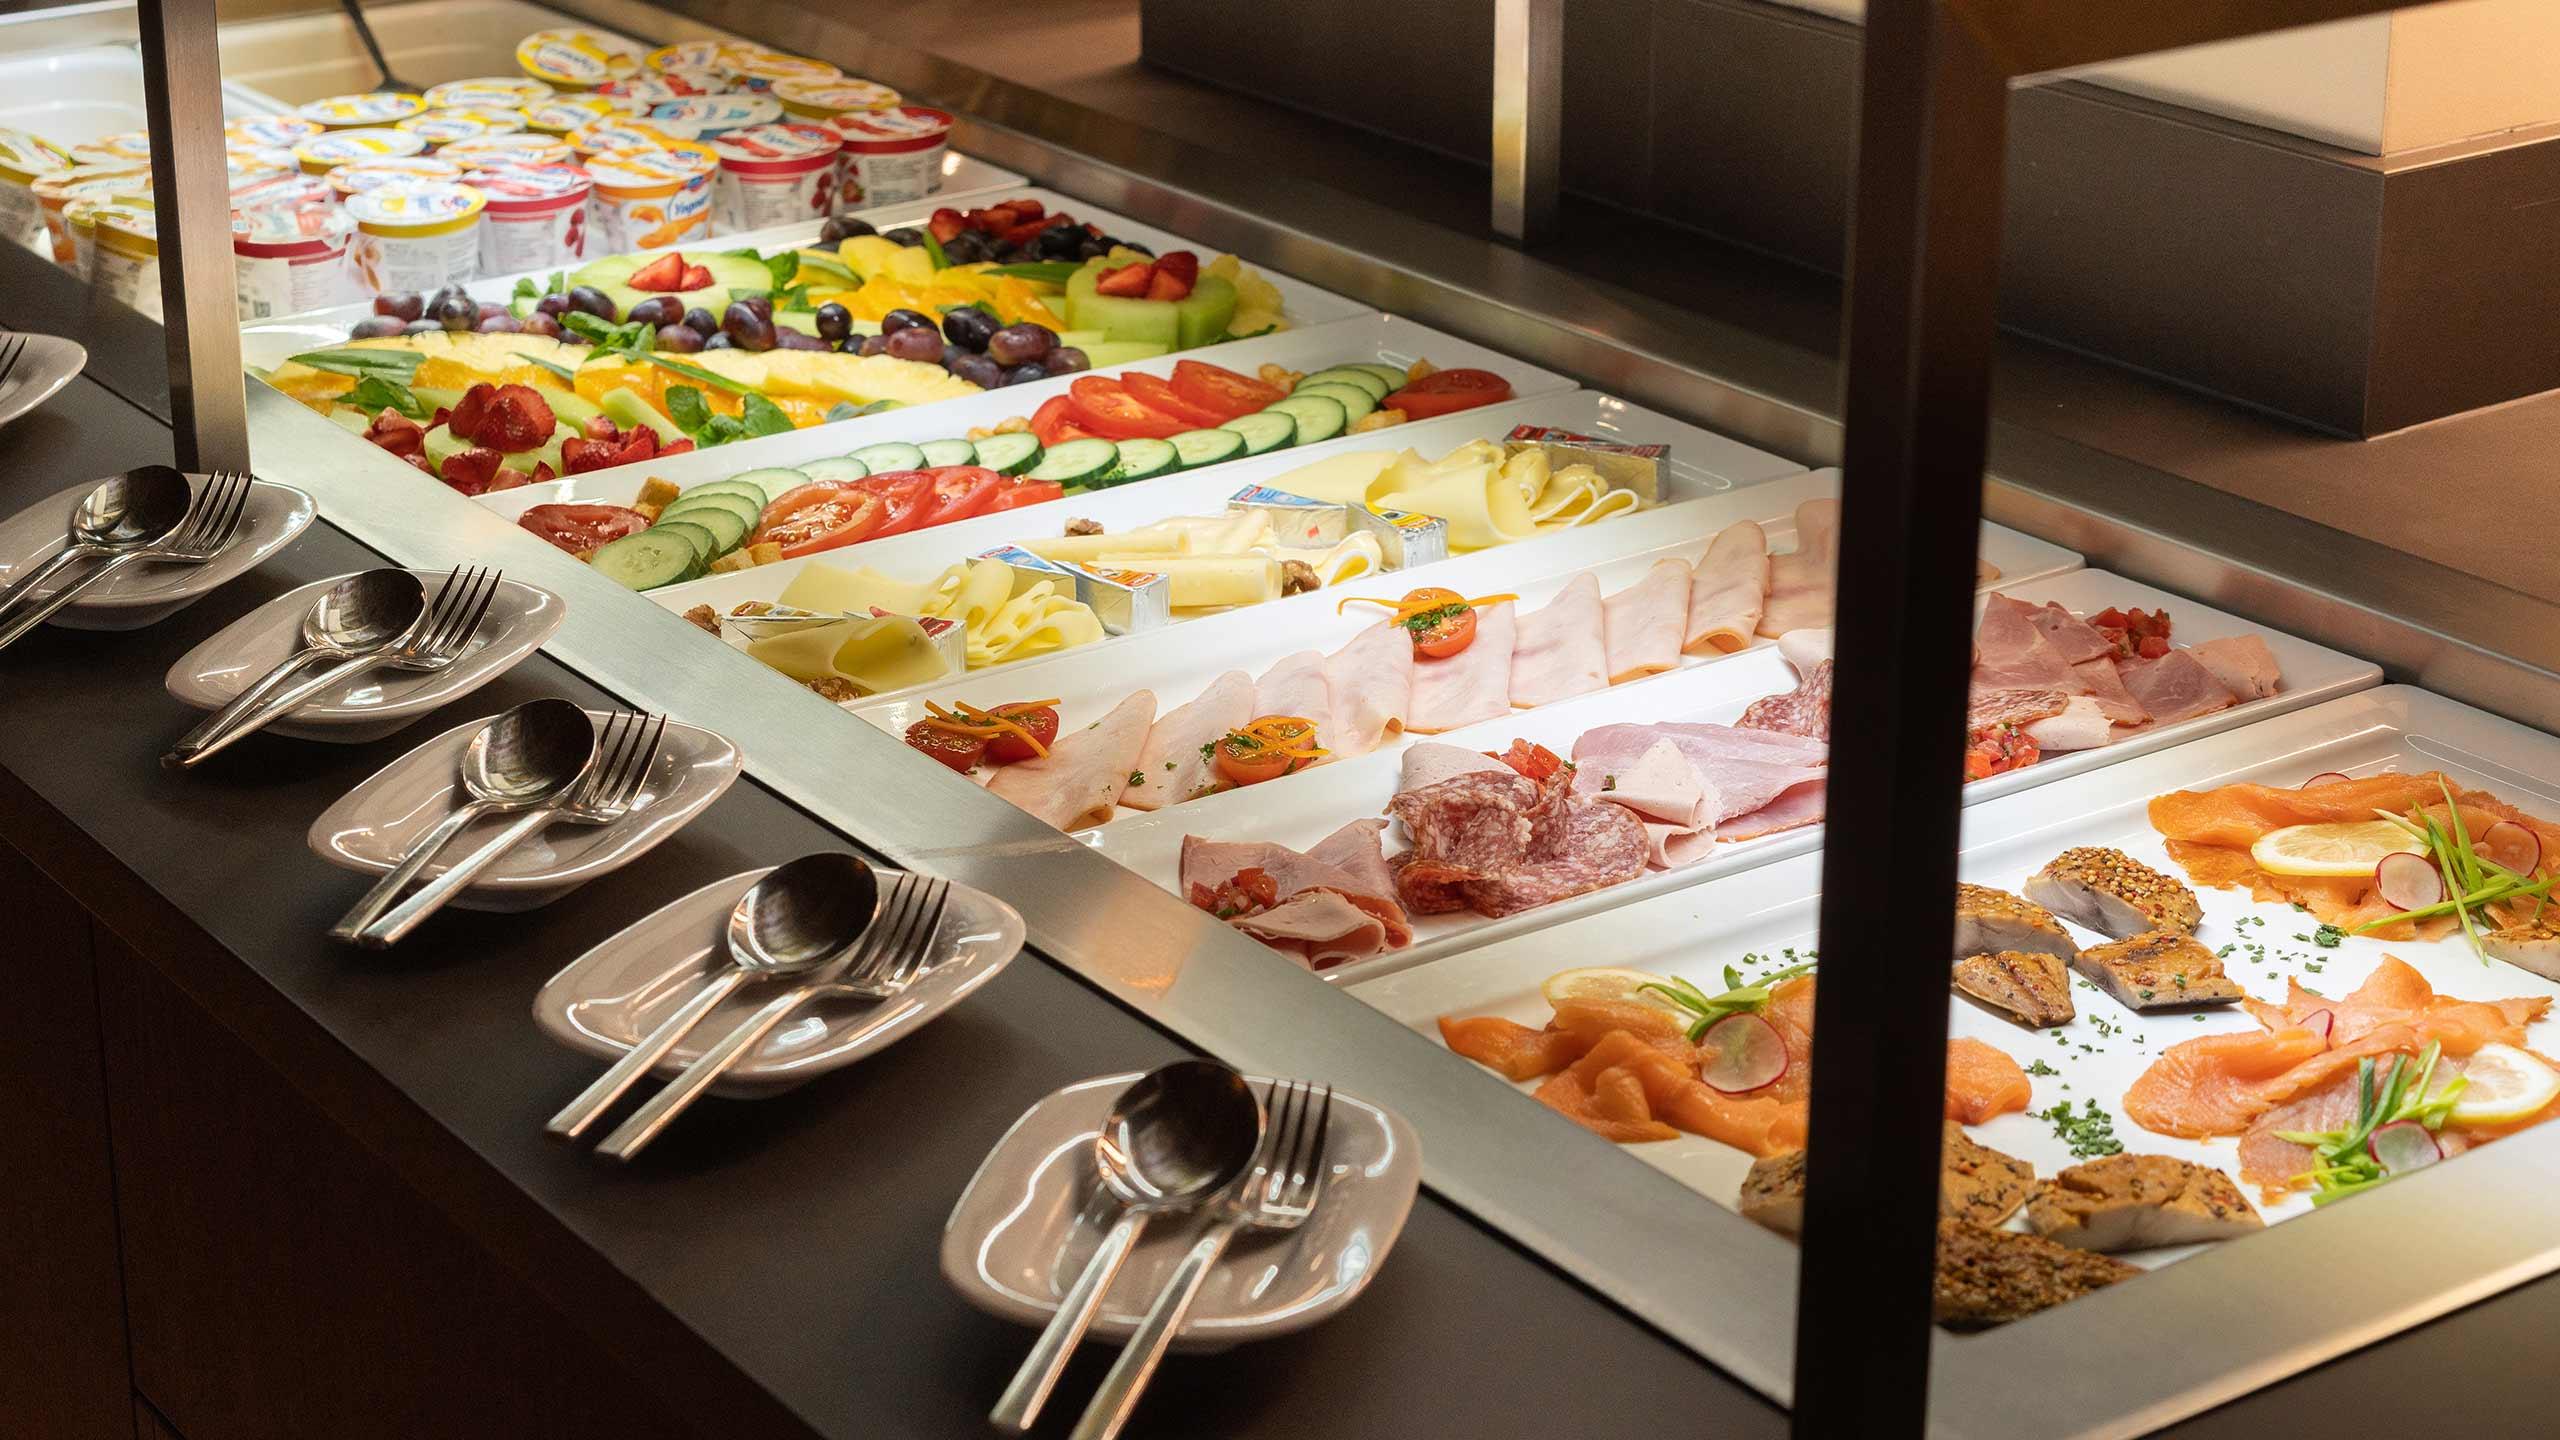 hotel-krebs-fruehstuck-auswahl-speisen.jpg